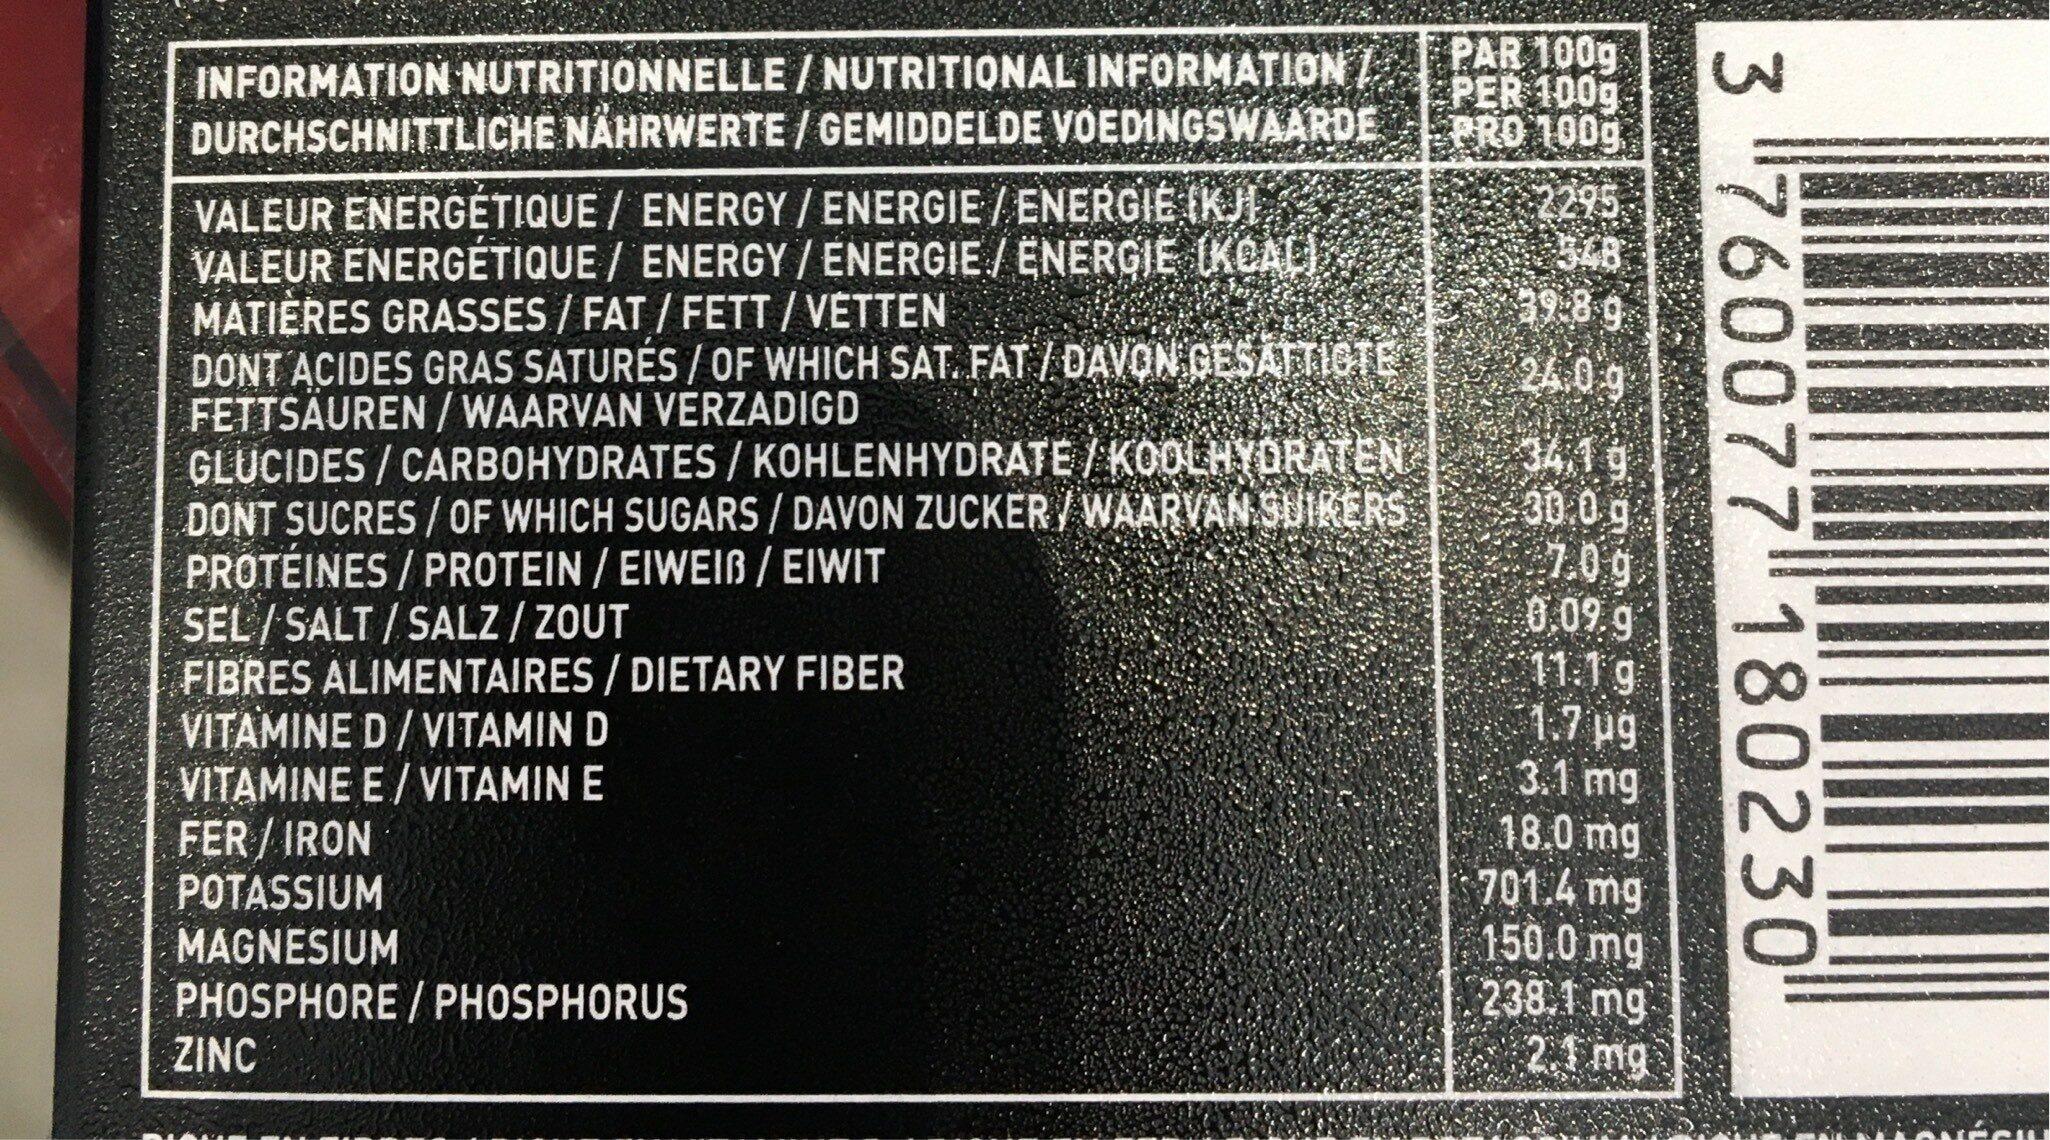 Chocolat 70 % écorces d'orange confites - Voedingswaarden - fr